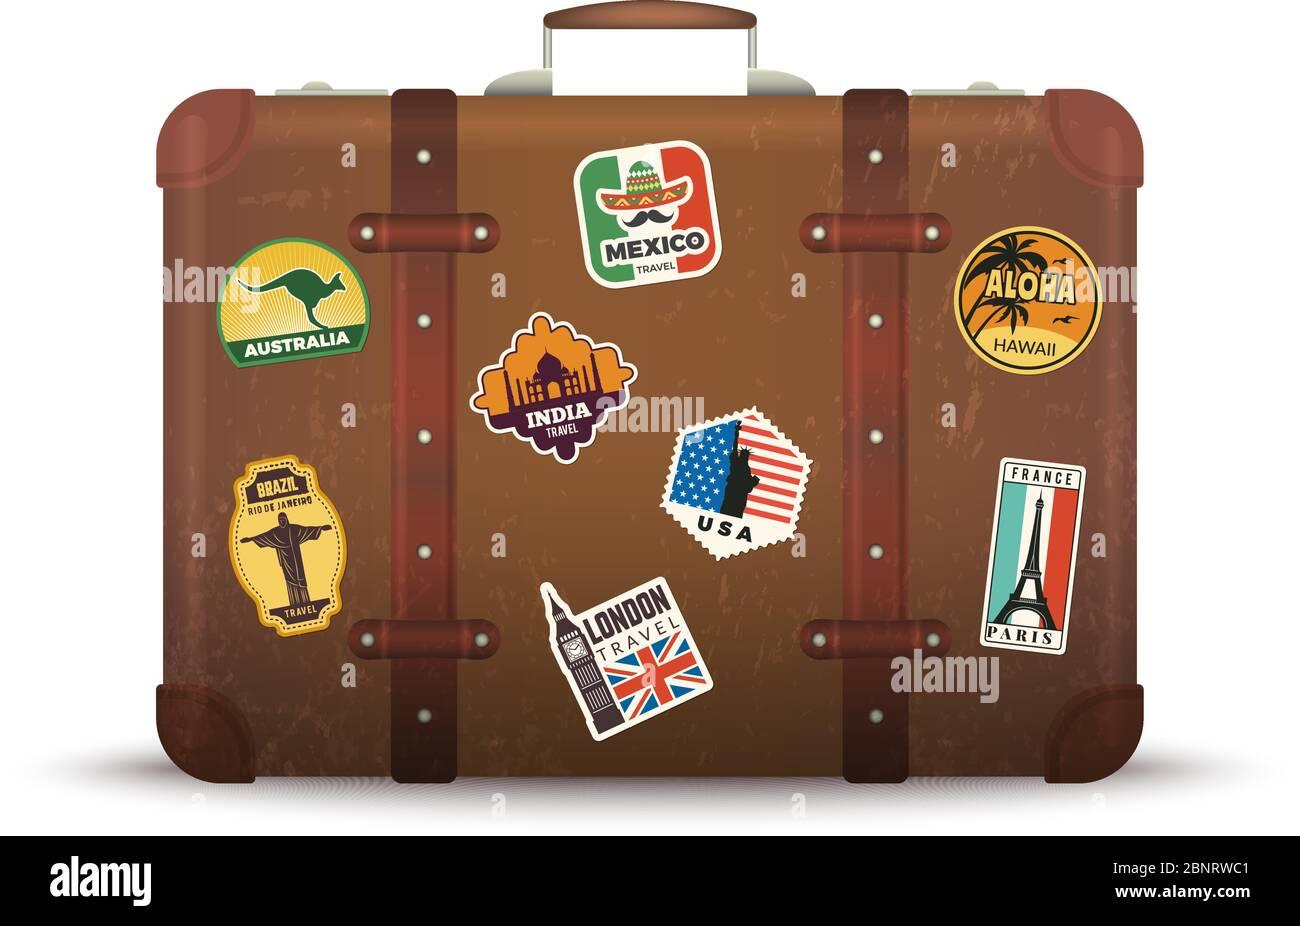 Retro Suitcase Sticker Switzerland Travel Theme Hotel Luggage Label Sticker Baggage Tag Vintage Travel Trunk Decal 59 Sticker Label